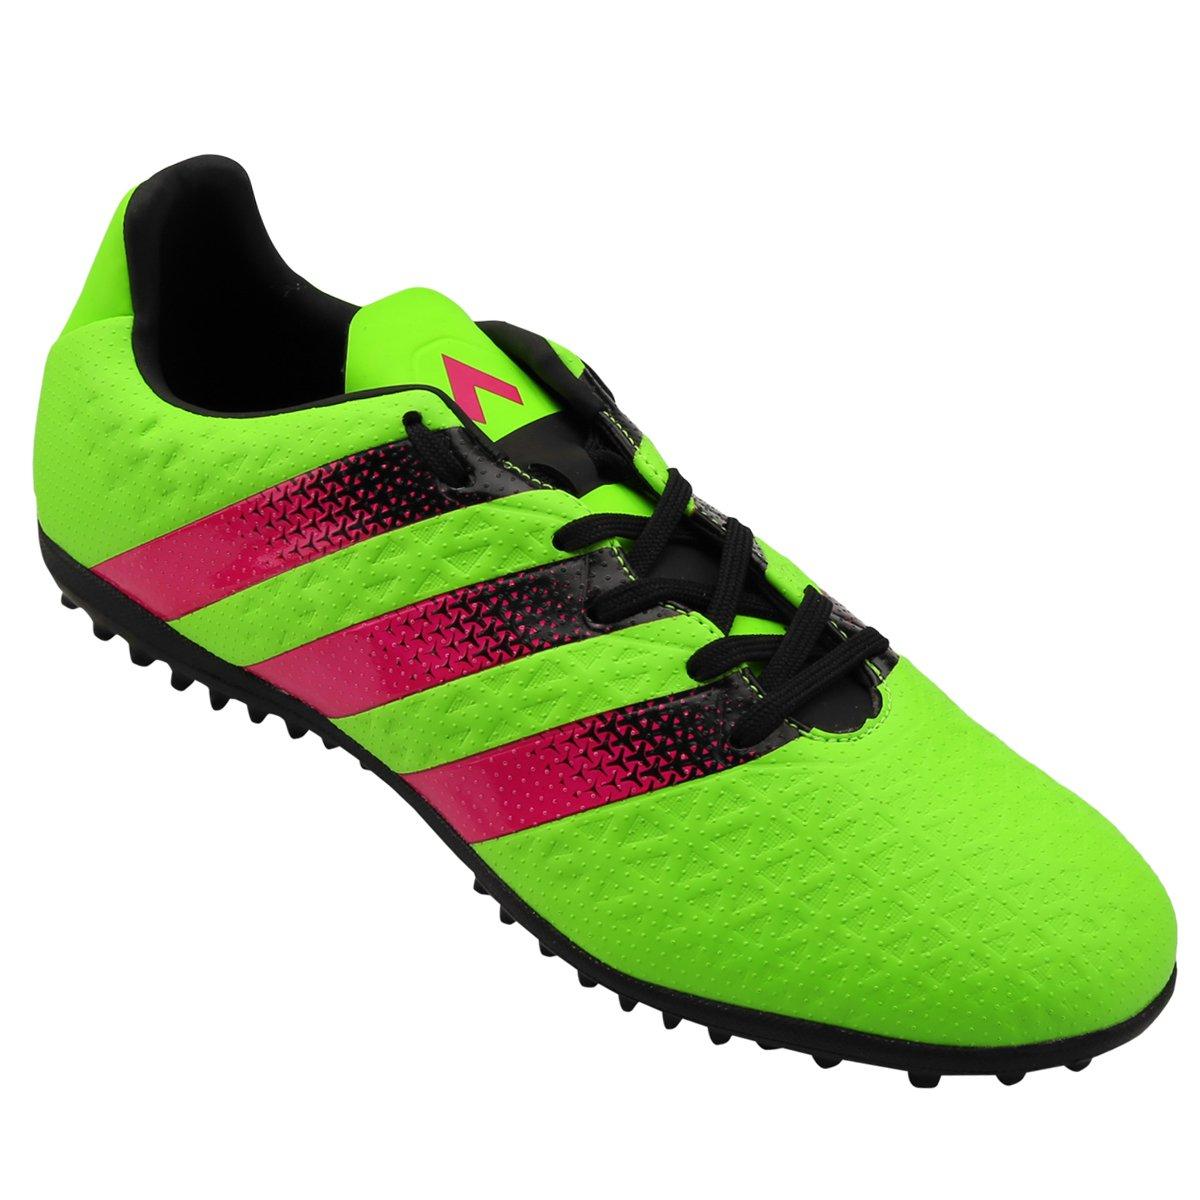 02bf4a1457 Chuteira Society Adidas Ace 16.3 TF Masculina - Verde Claro e Pink ...